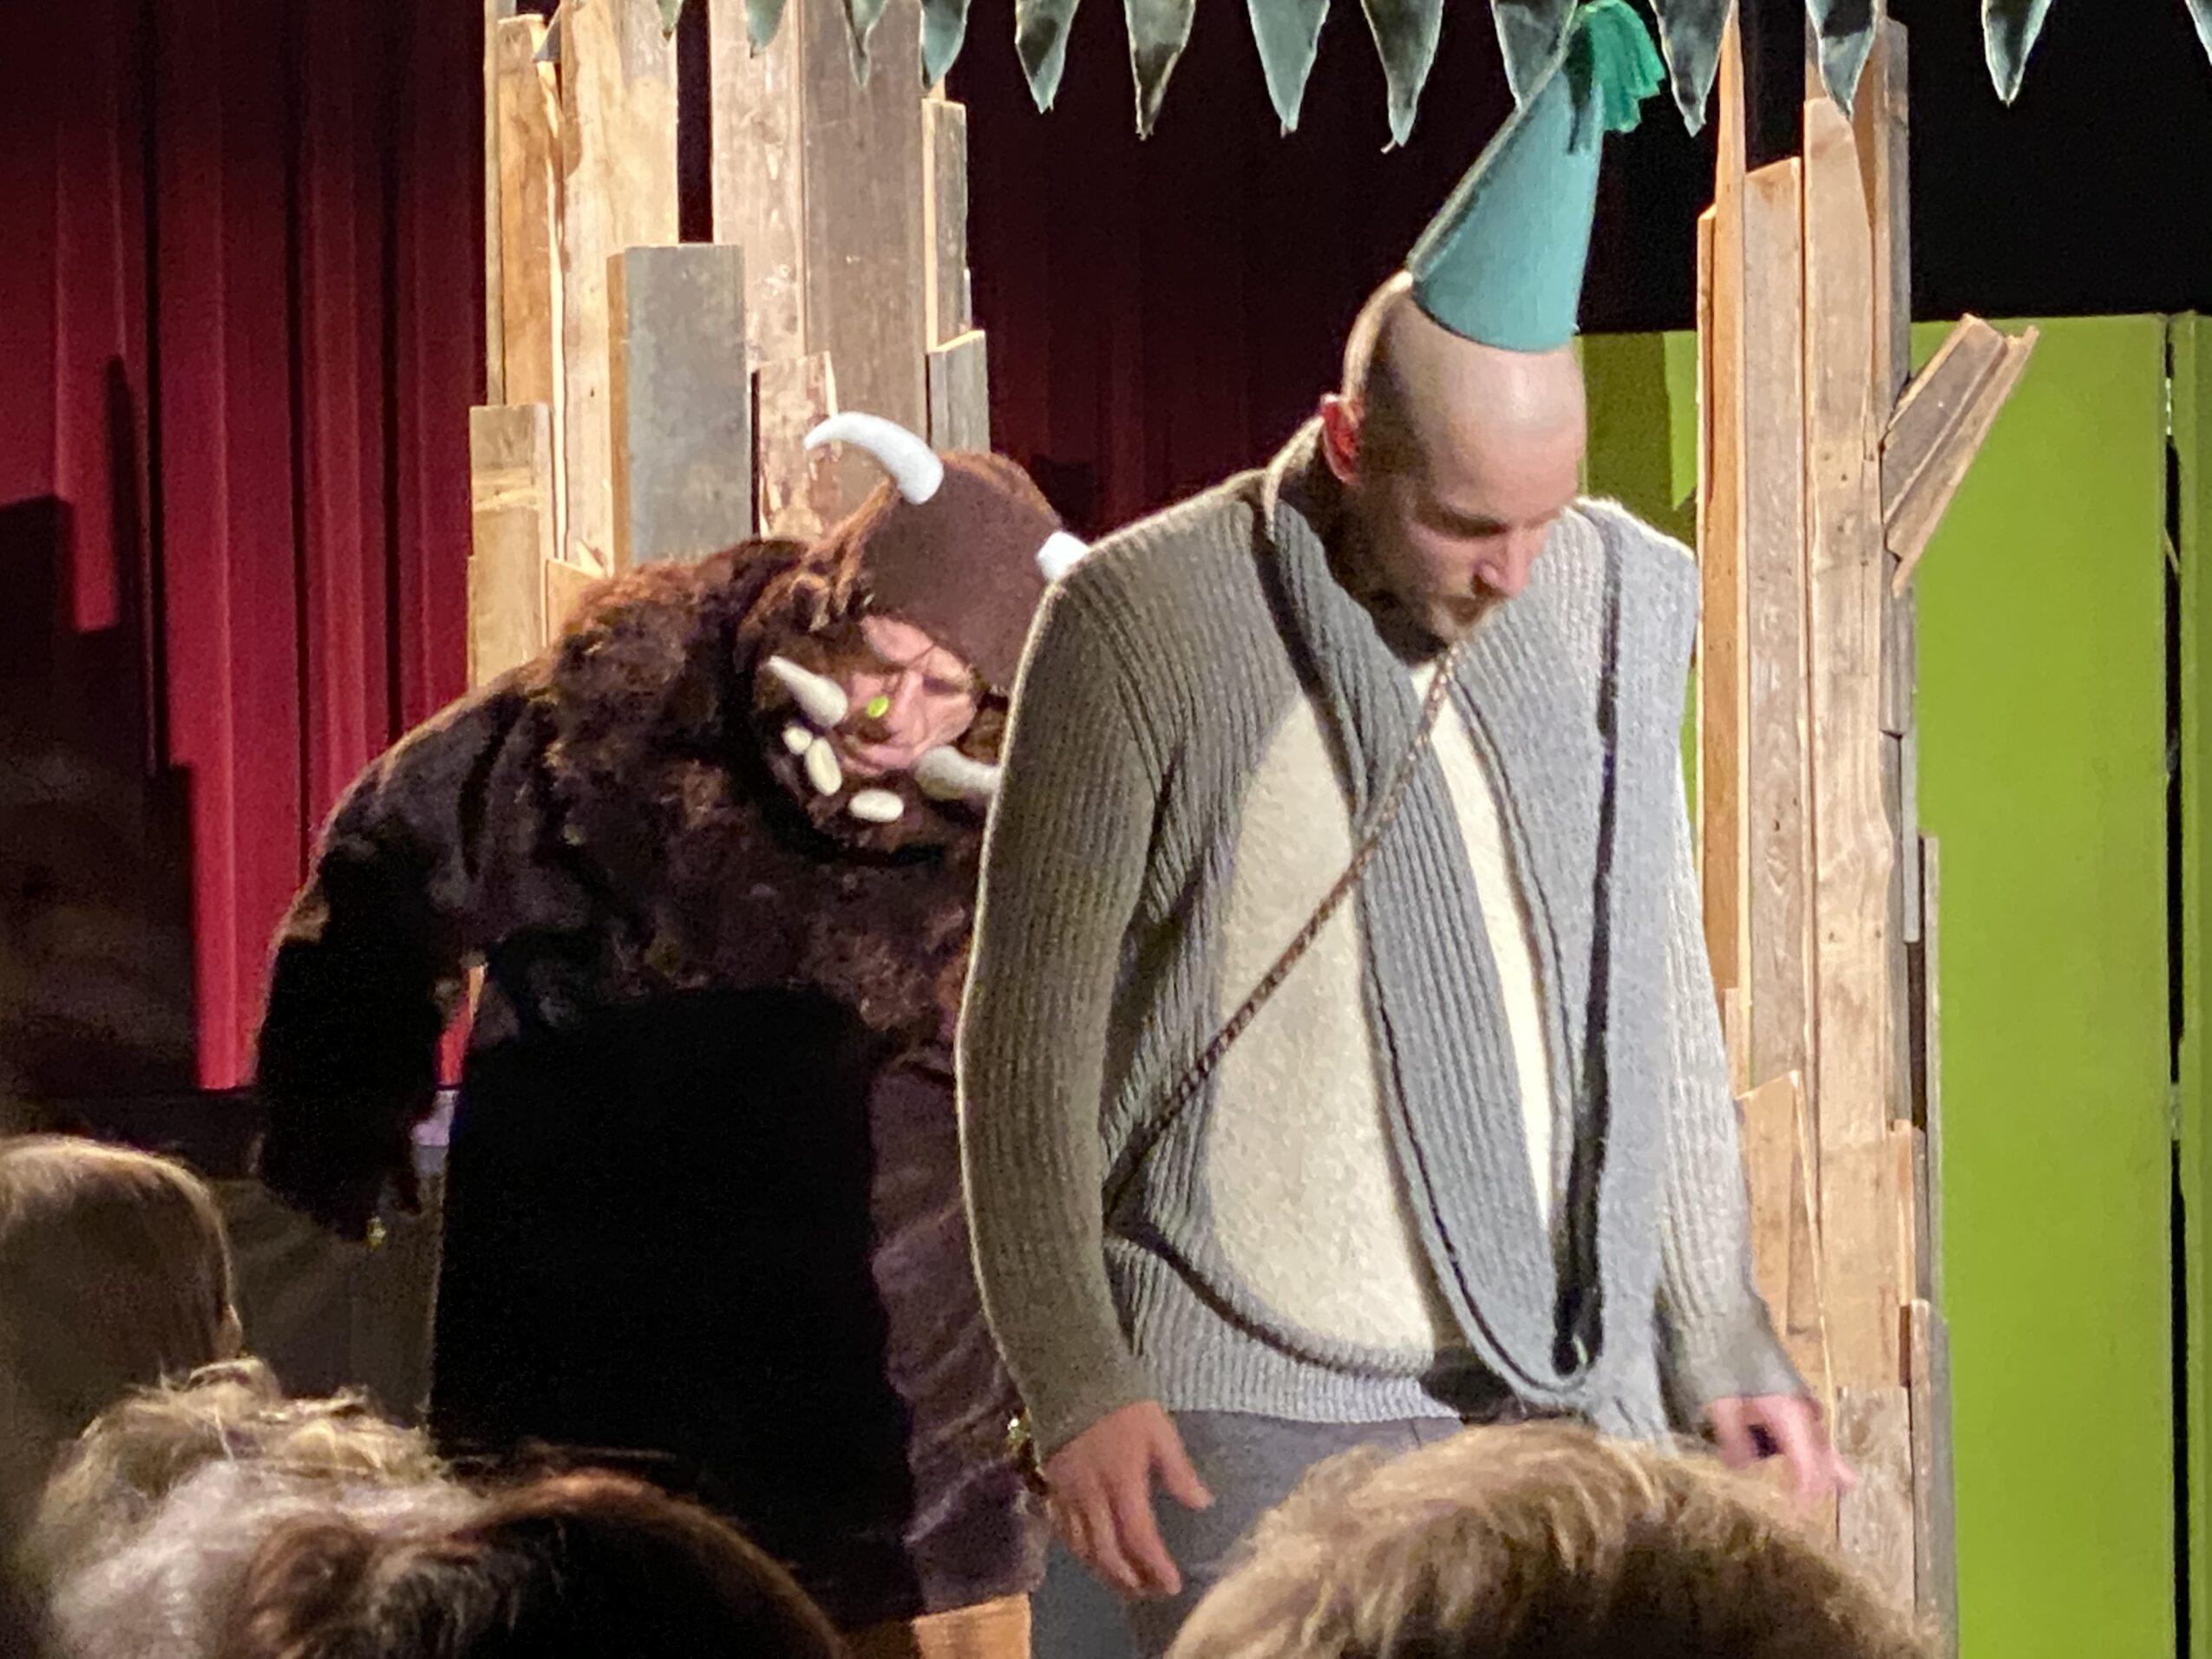 De Gruffalo theatervoorstelling